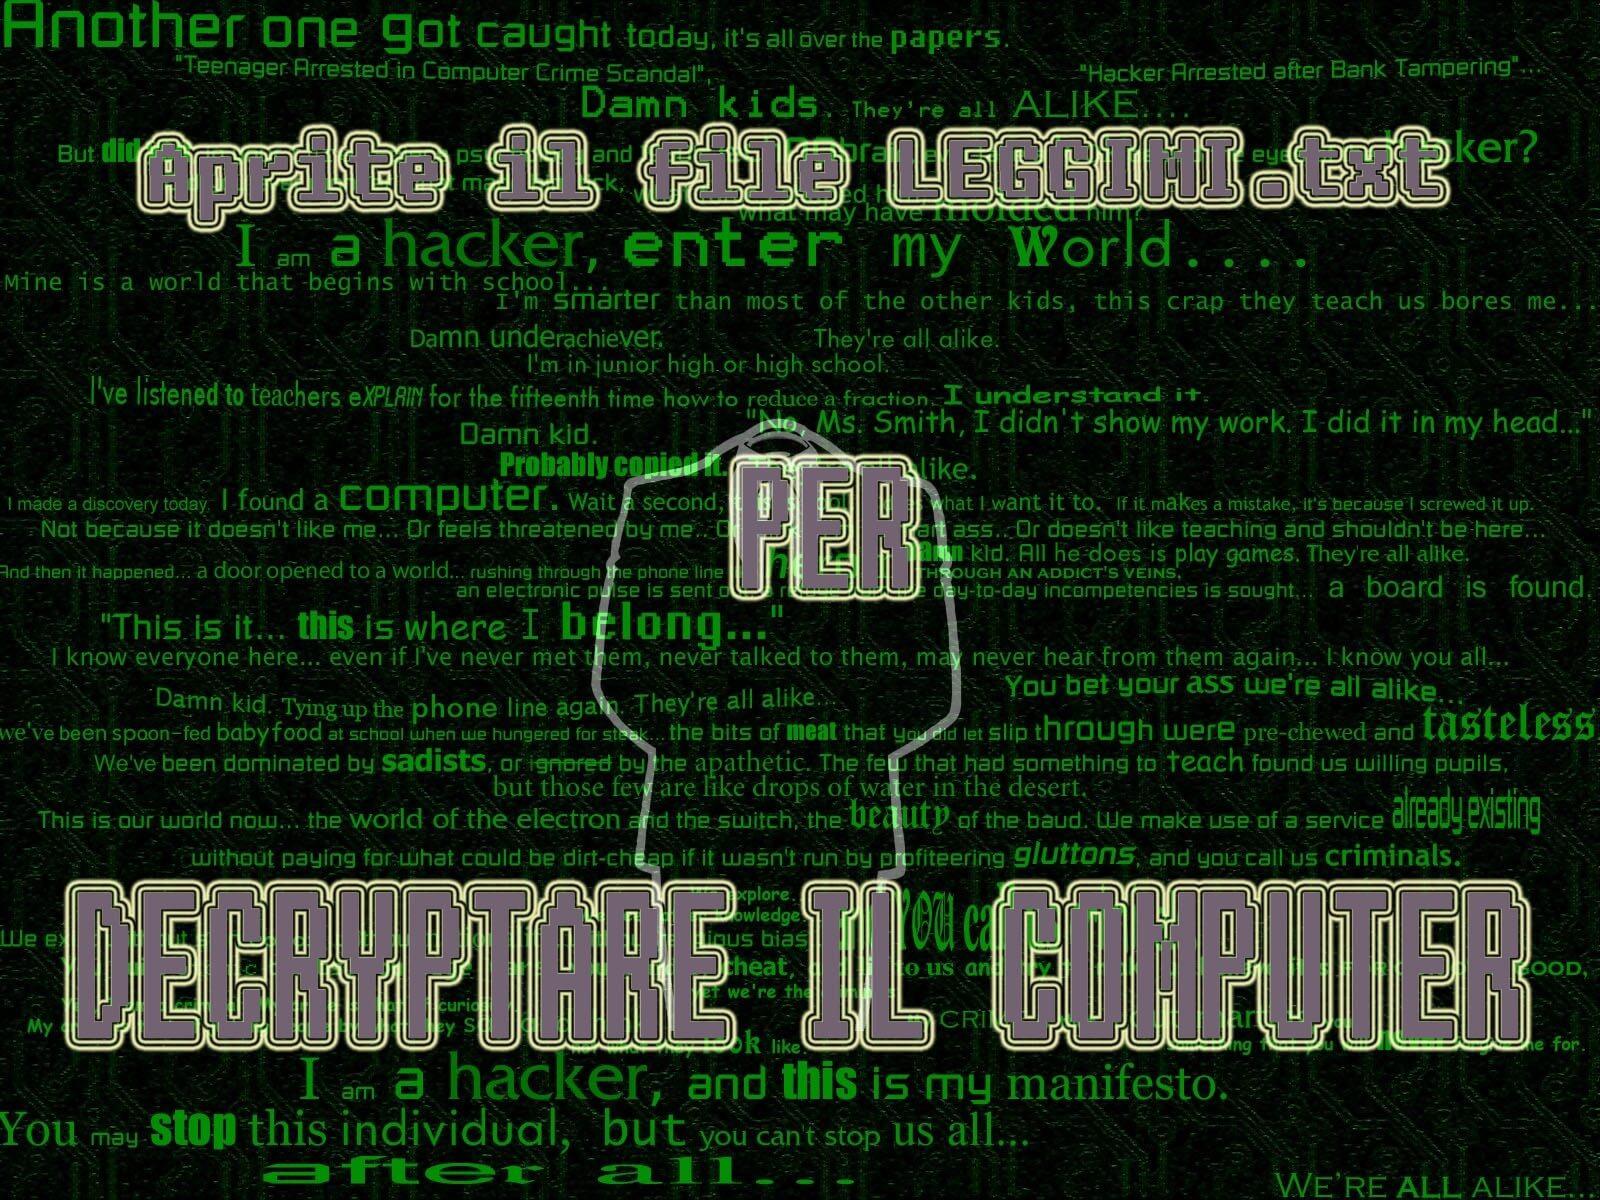 Crypt888 v4 ransomware screenshot